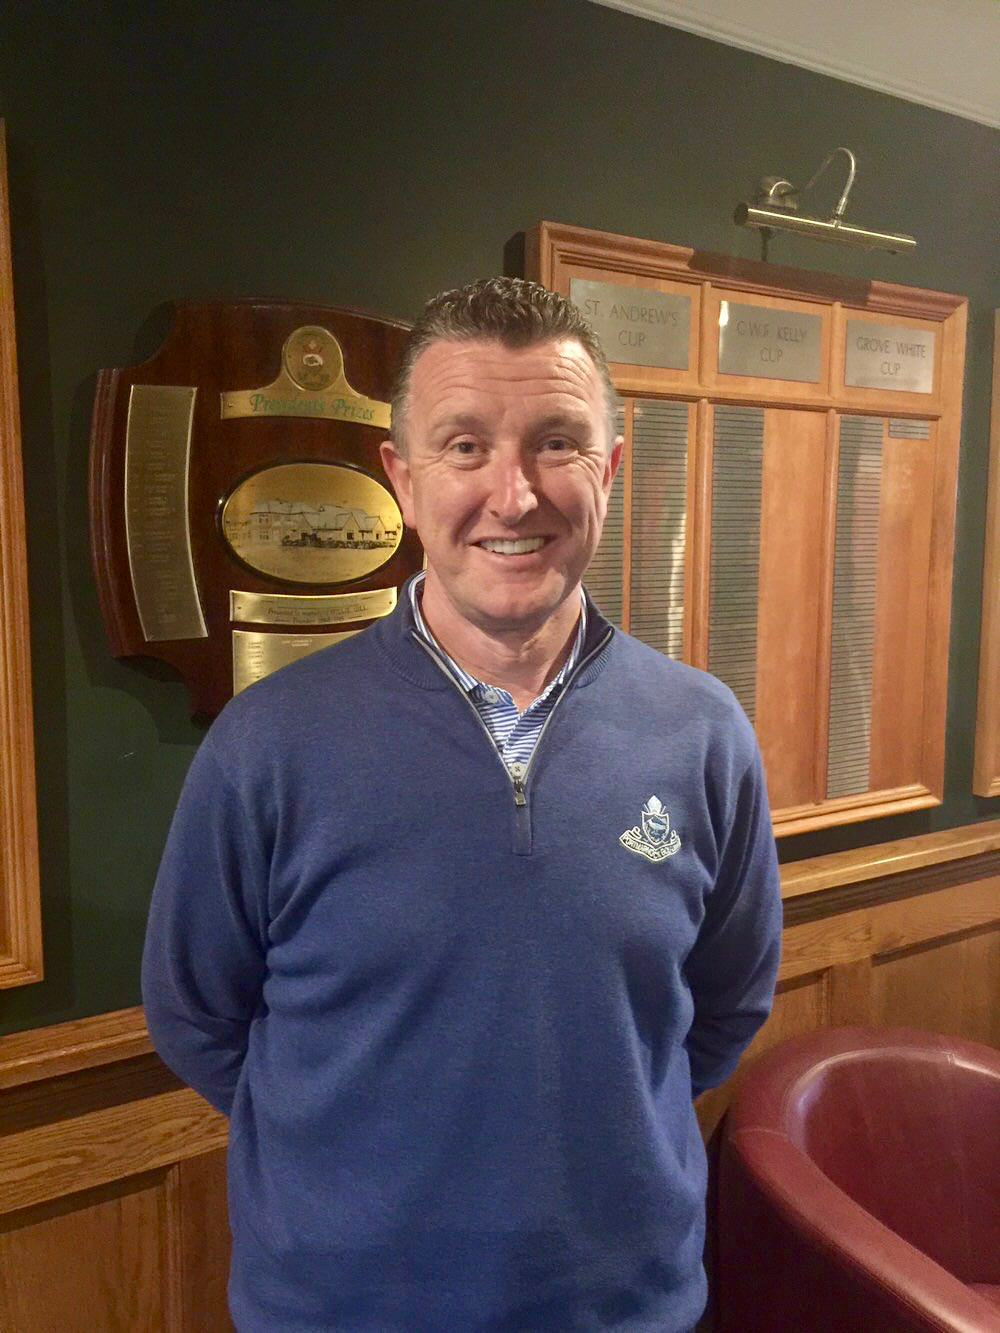 Francis Howley at his new home, Portmarnock Golf Club